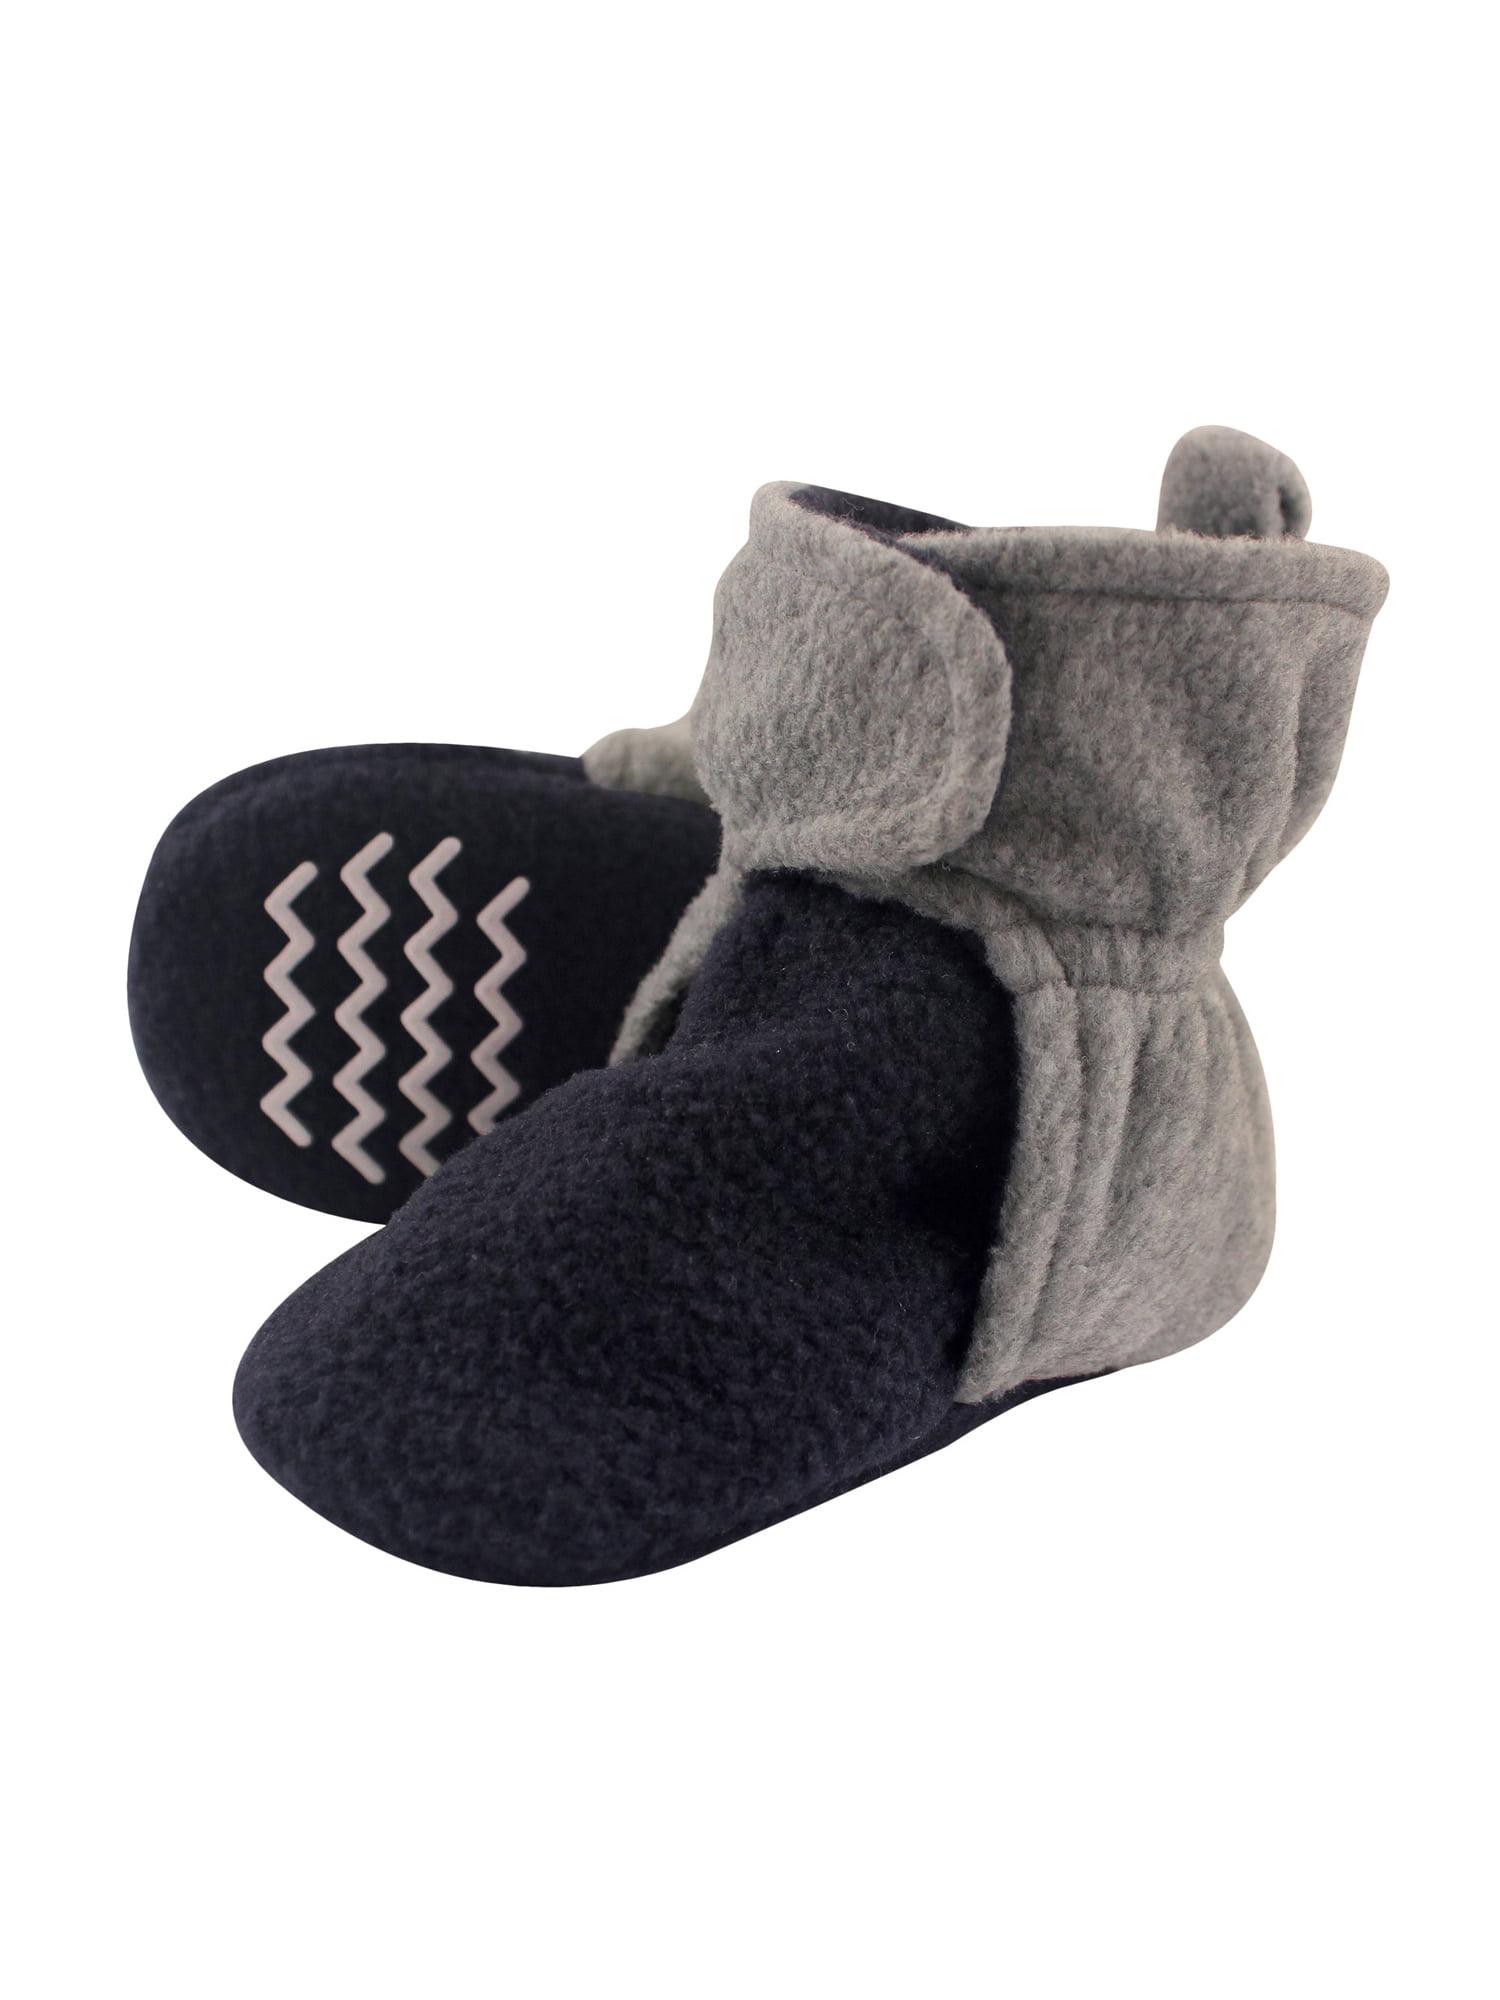 Boy Cozy Fleece Booties by Hudson Baby